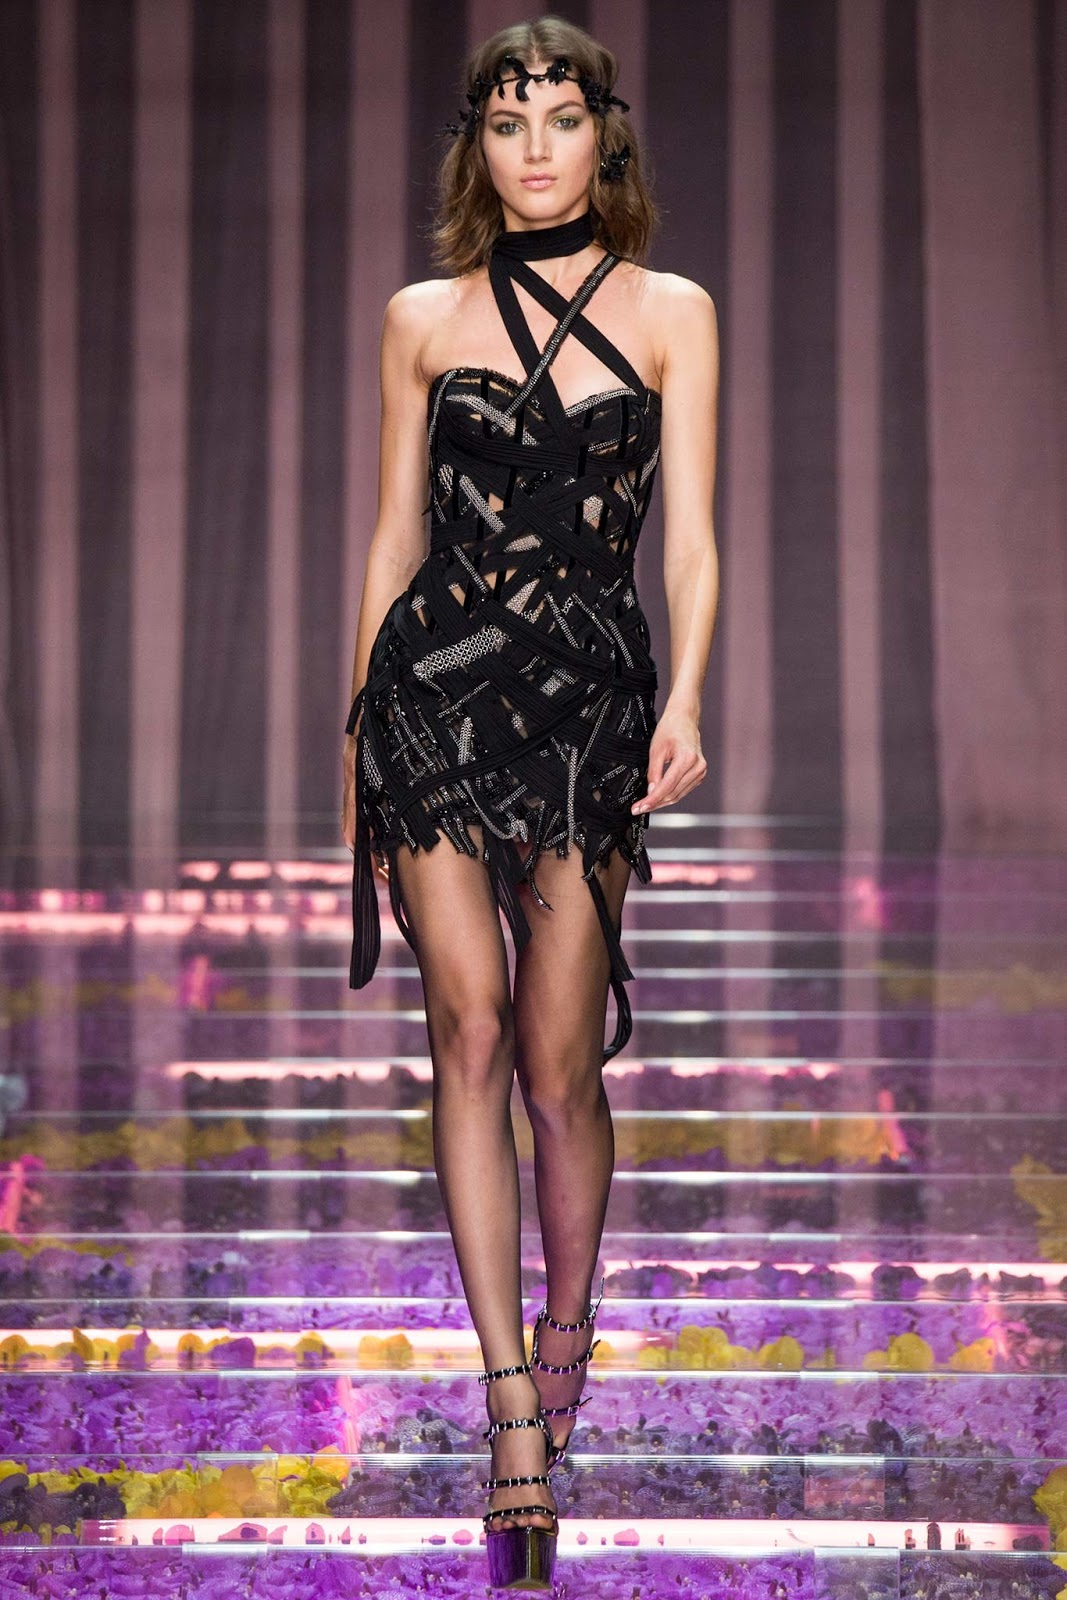 Well known fashion stylists 16 Best Fashion Stylists on Instagram - theFashionSpot